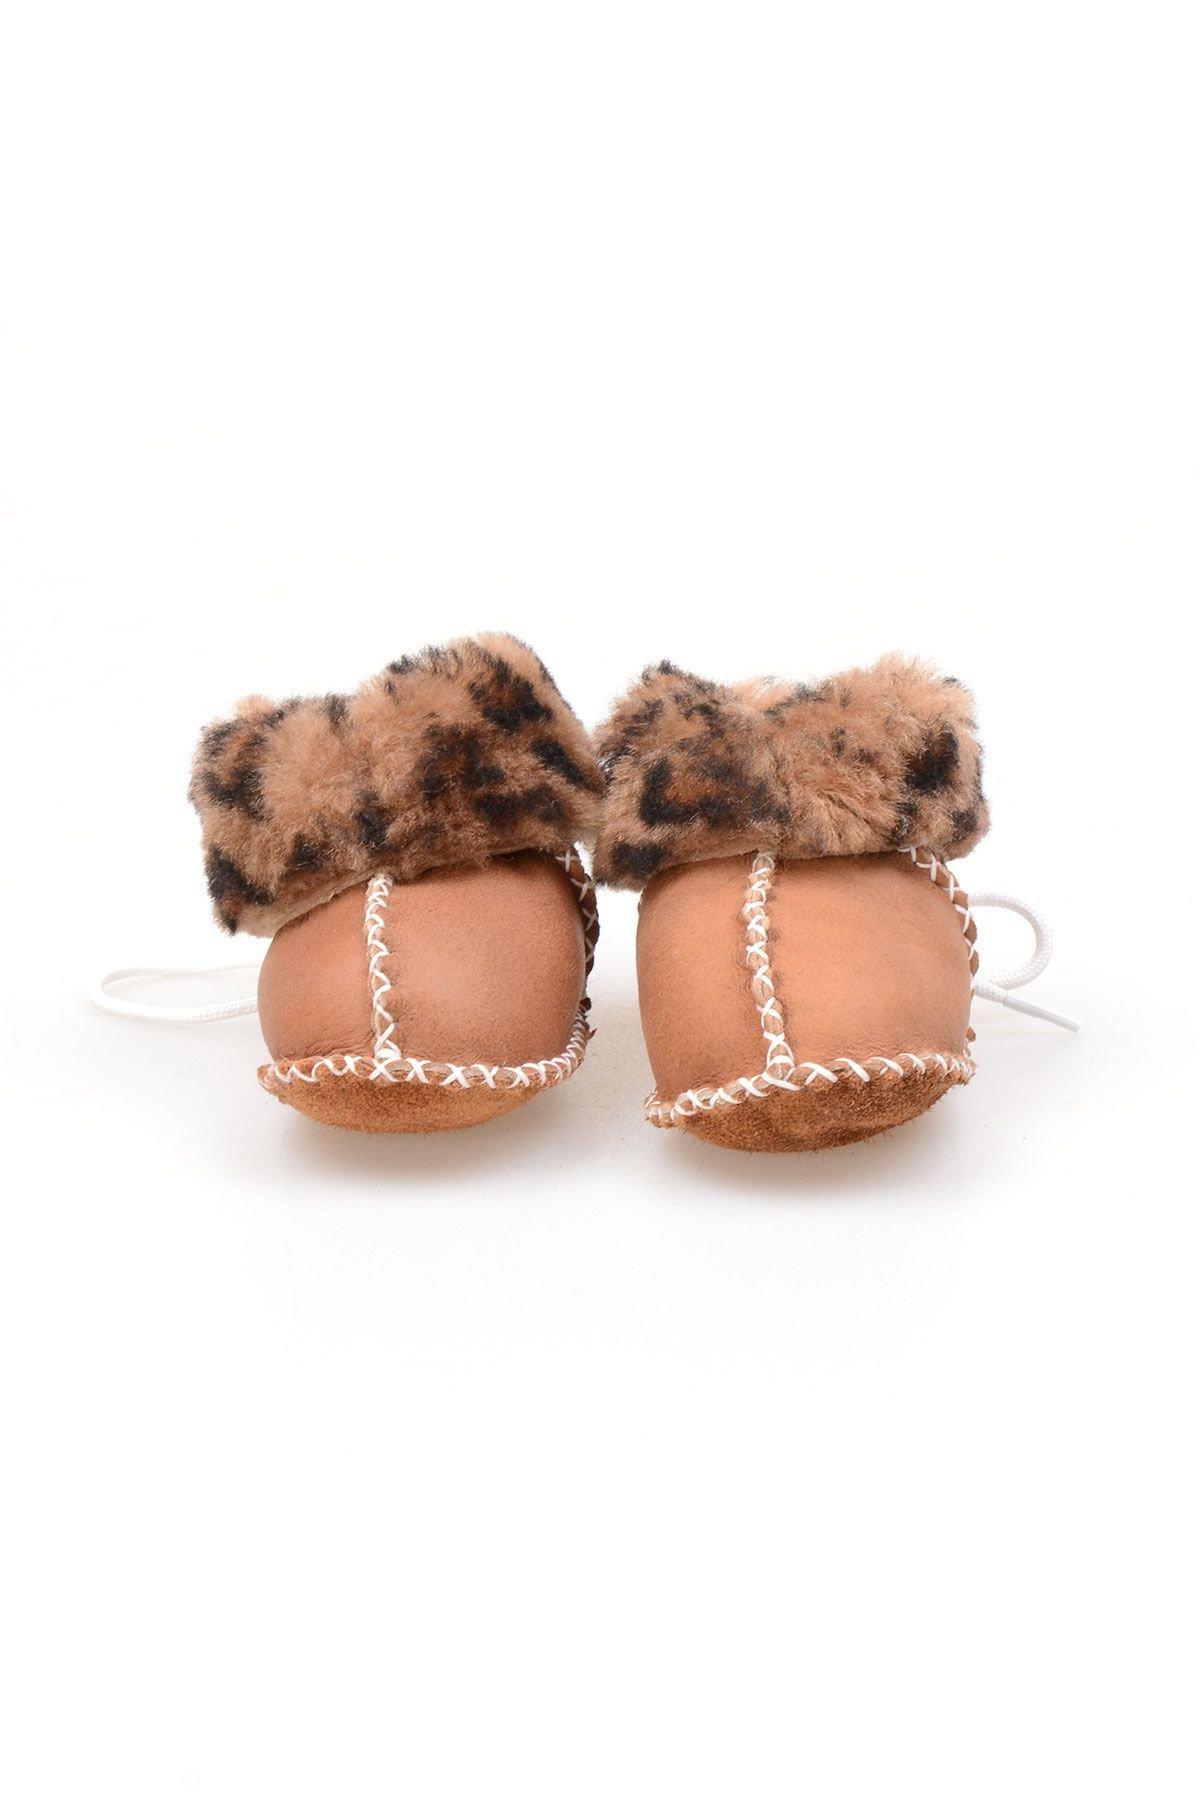 Pegia Genuine Shearling Laced Kid's Booties 141109 Visone